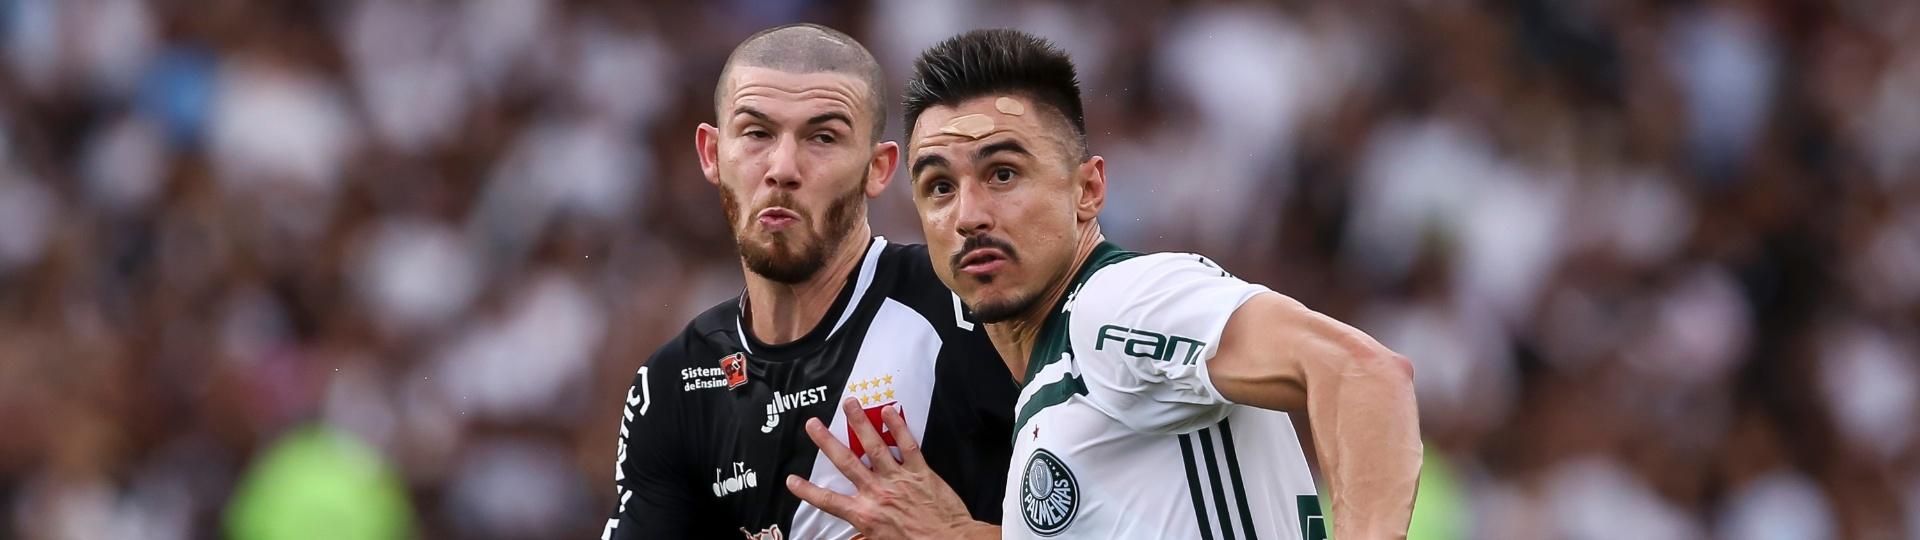 Willian disputa bola durante Vasco x Palmeiras